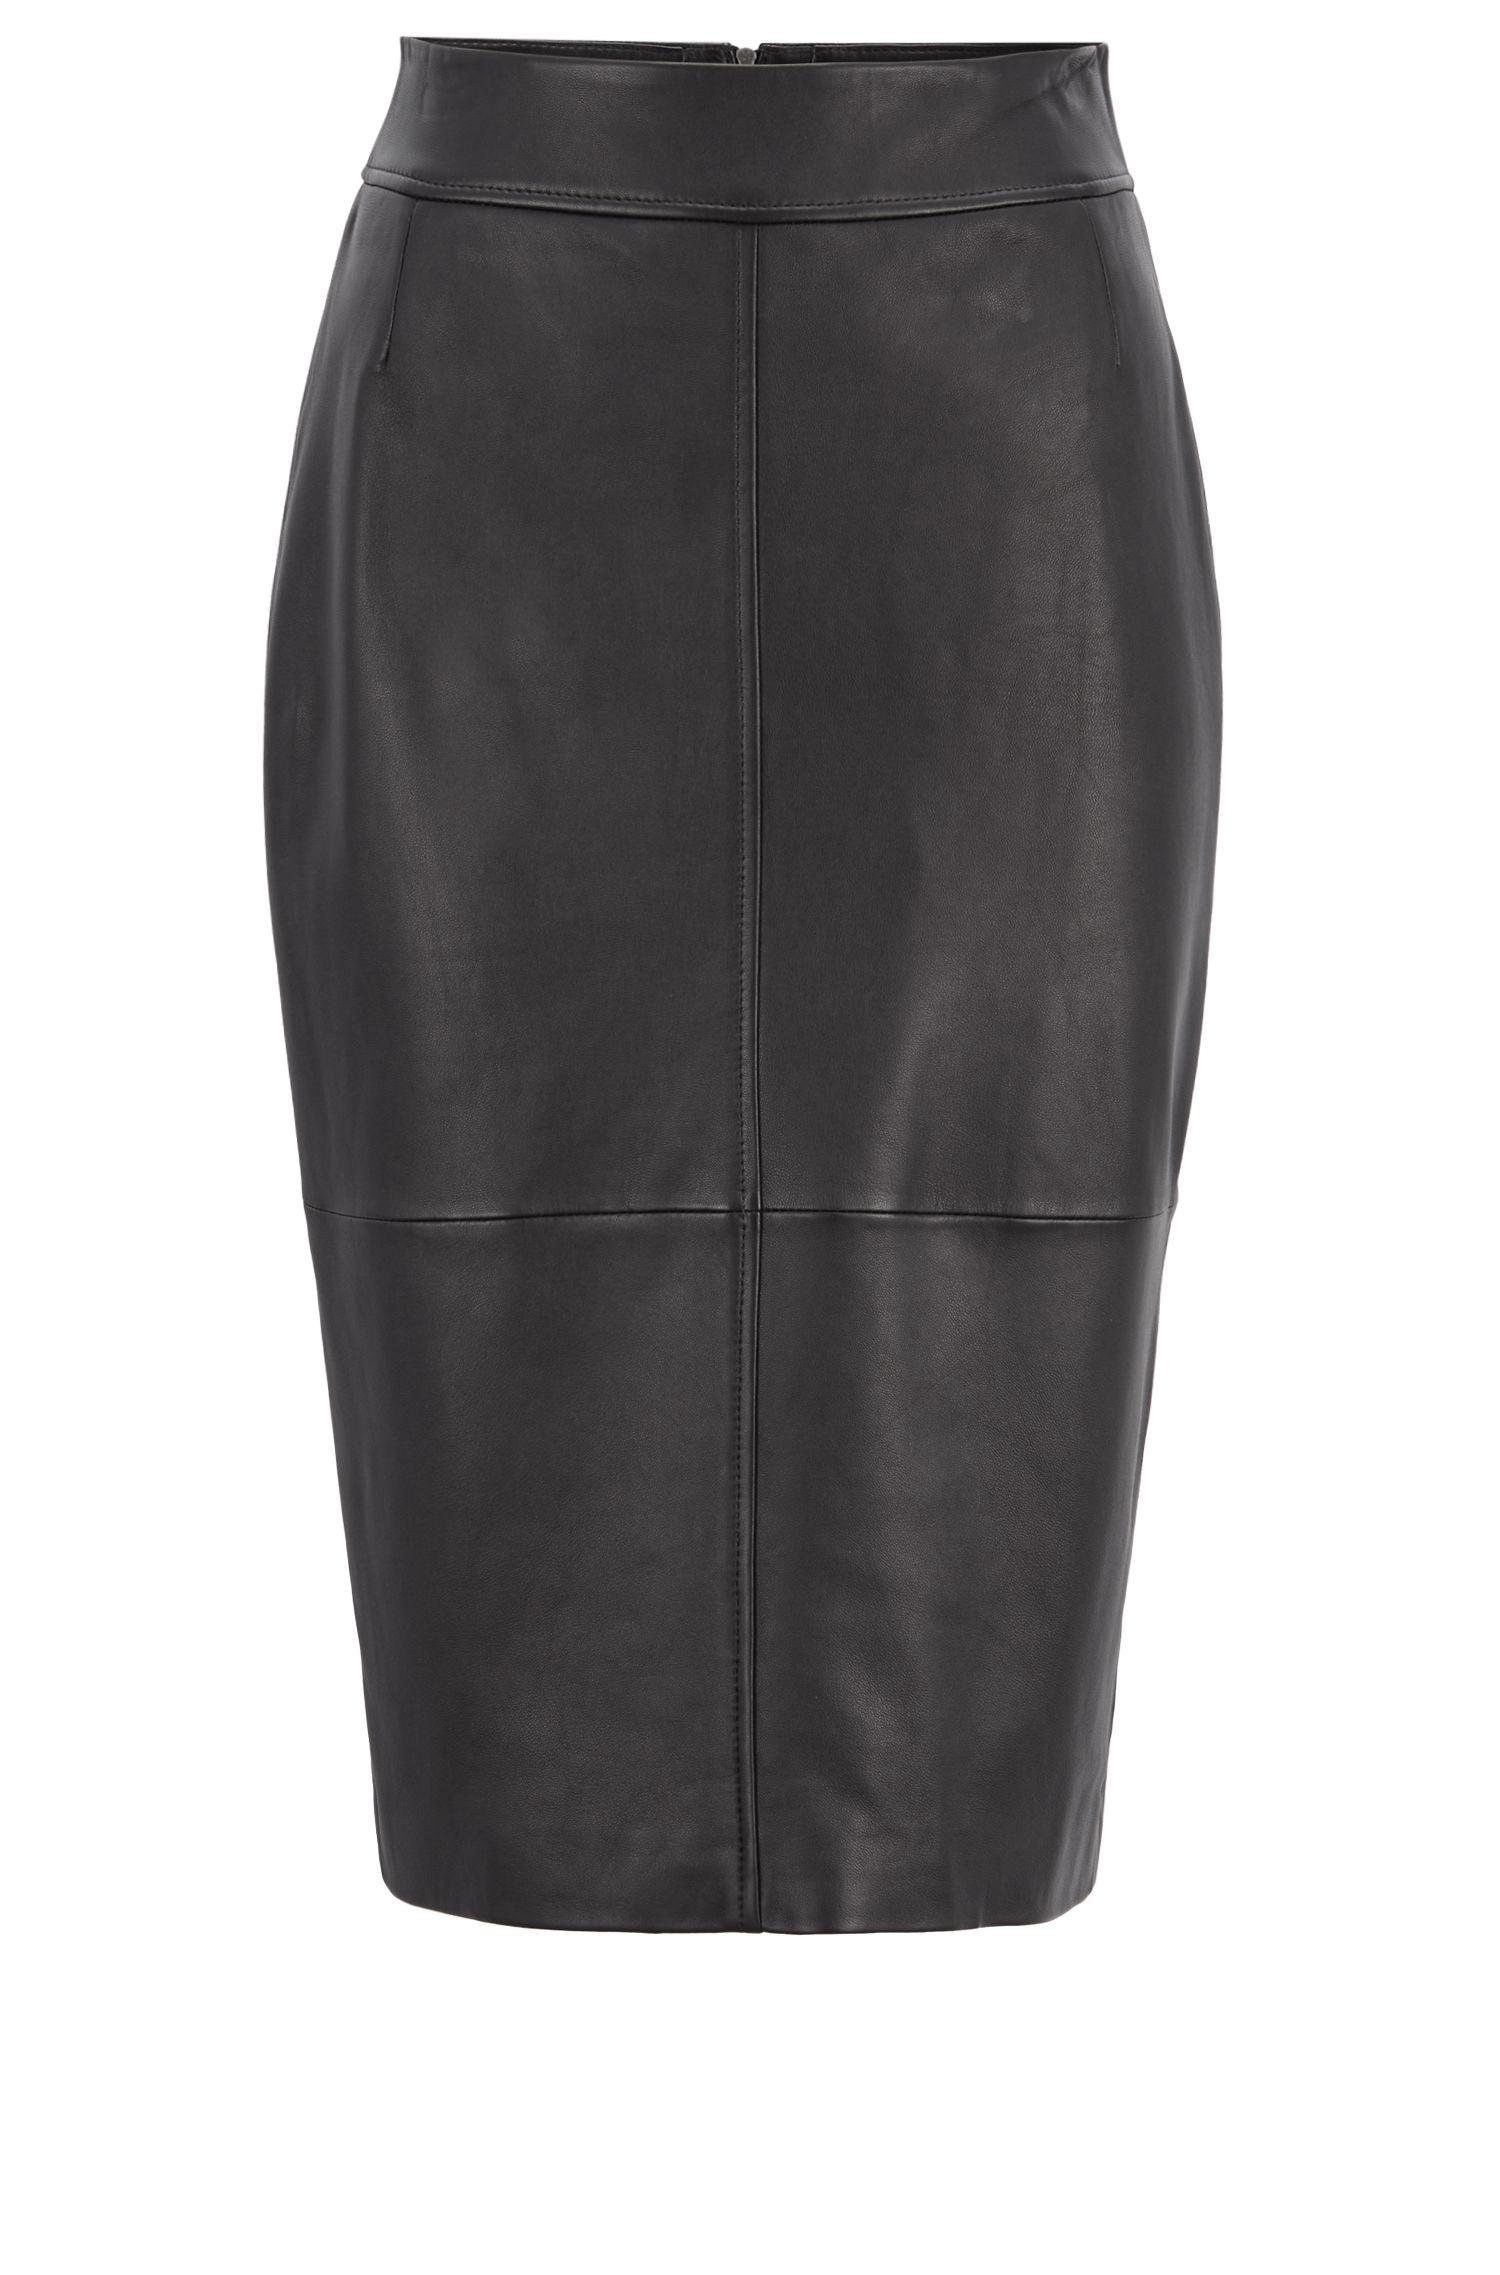 Hugo Boss - Regular-fit pencil skirt in lambskin - 1